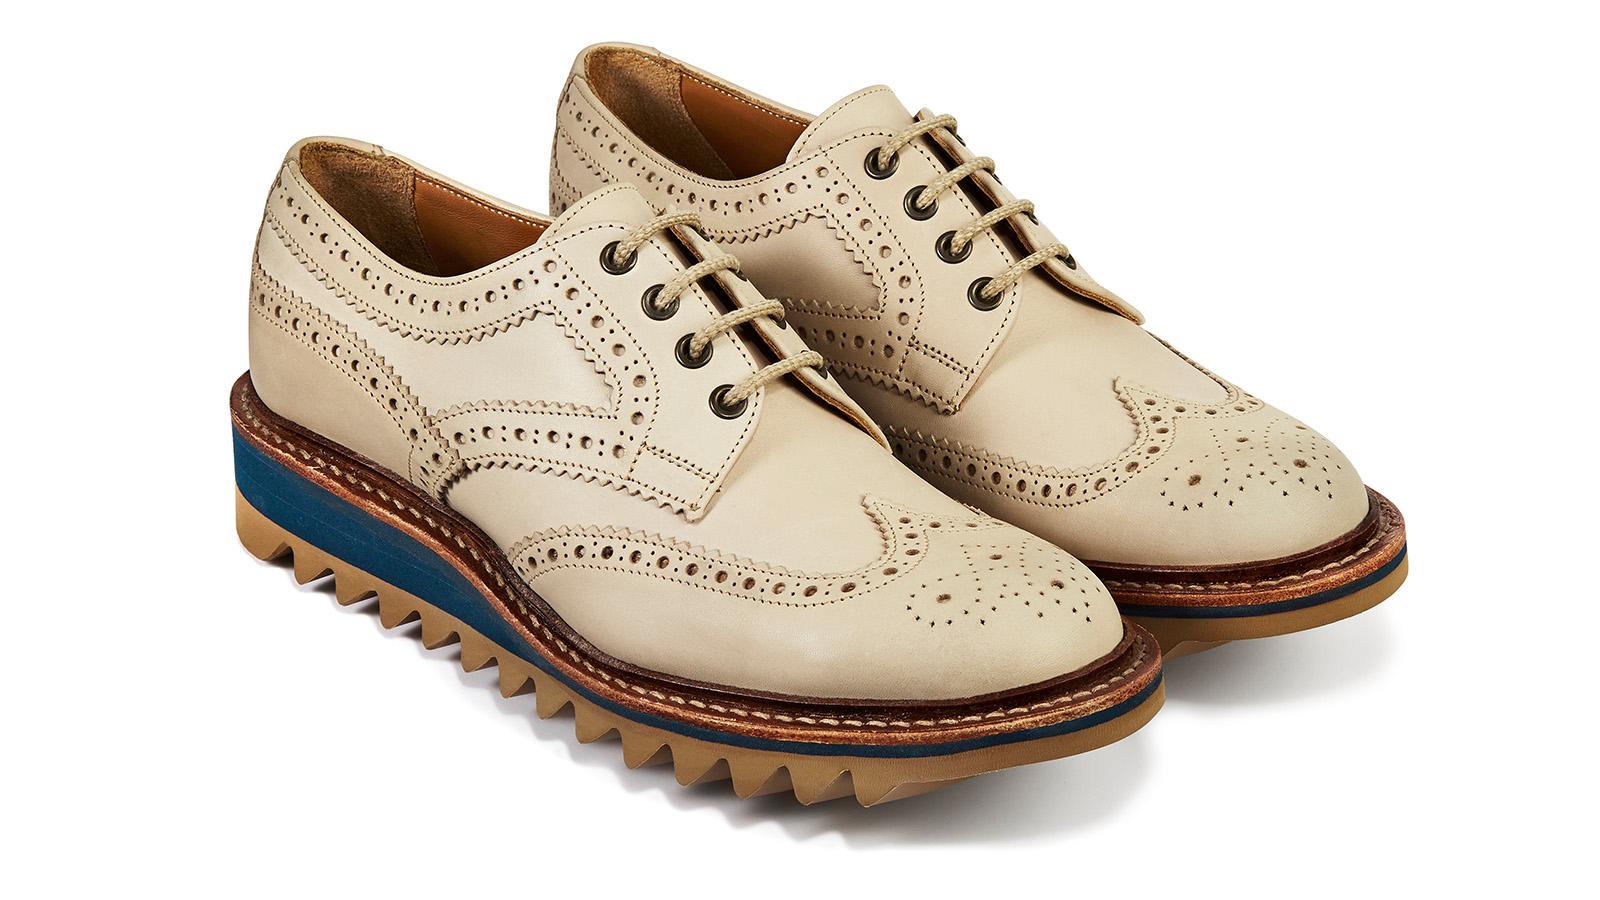 Apex Brogue shoes